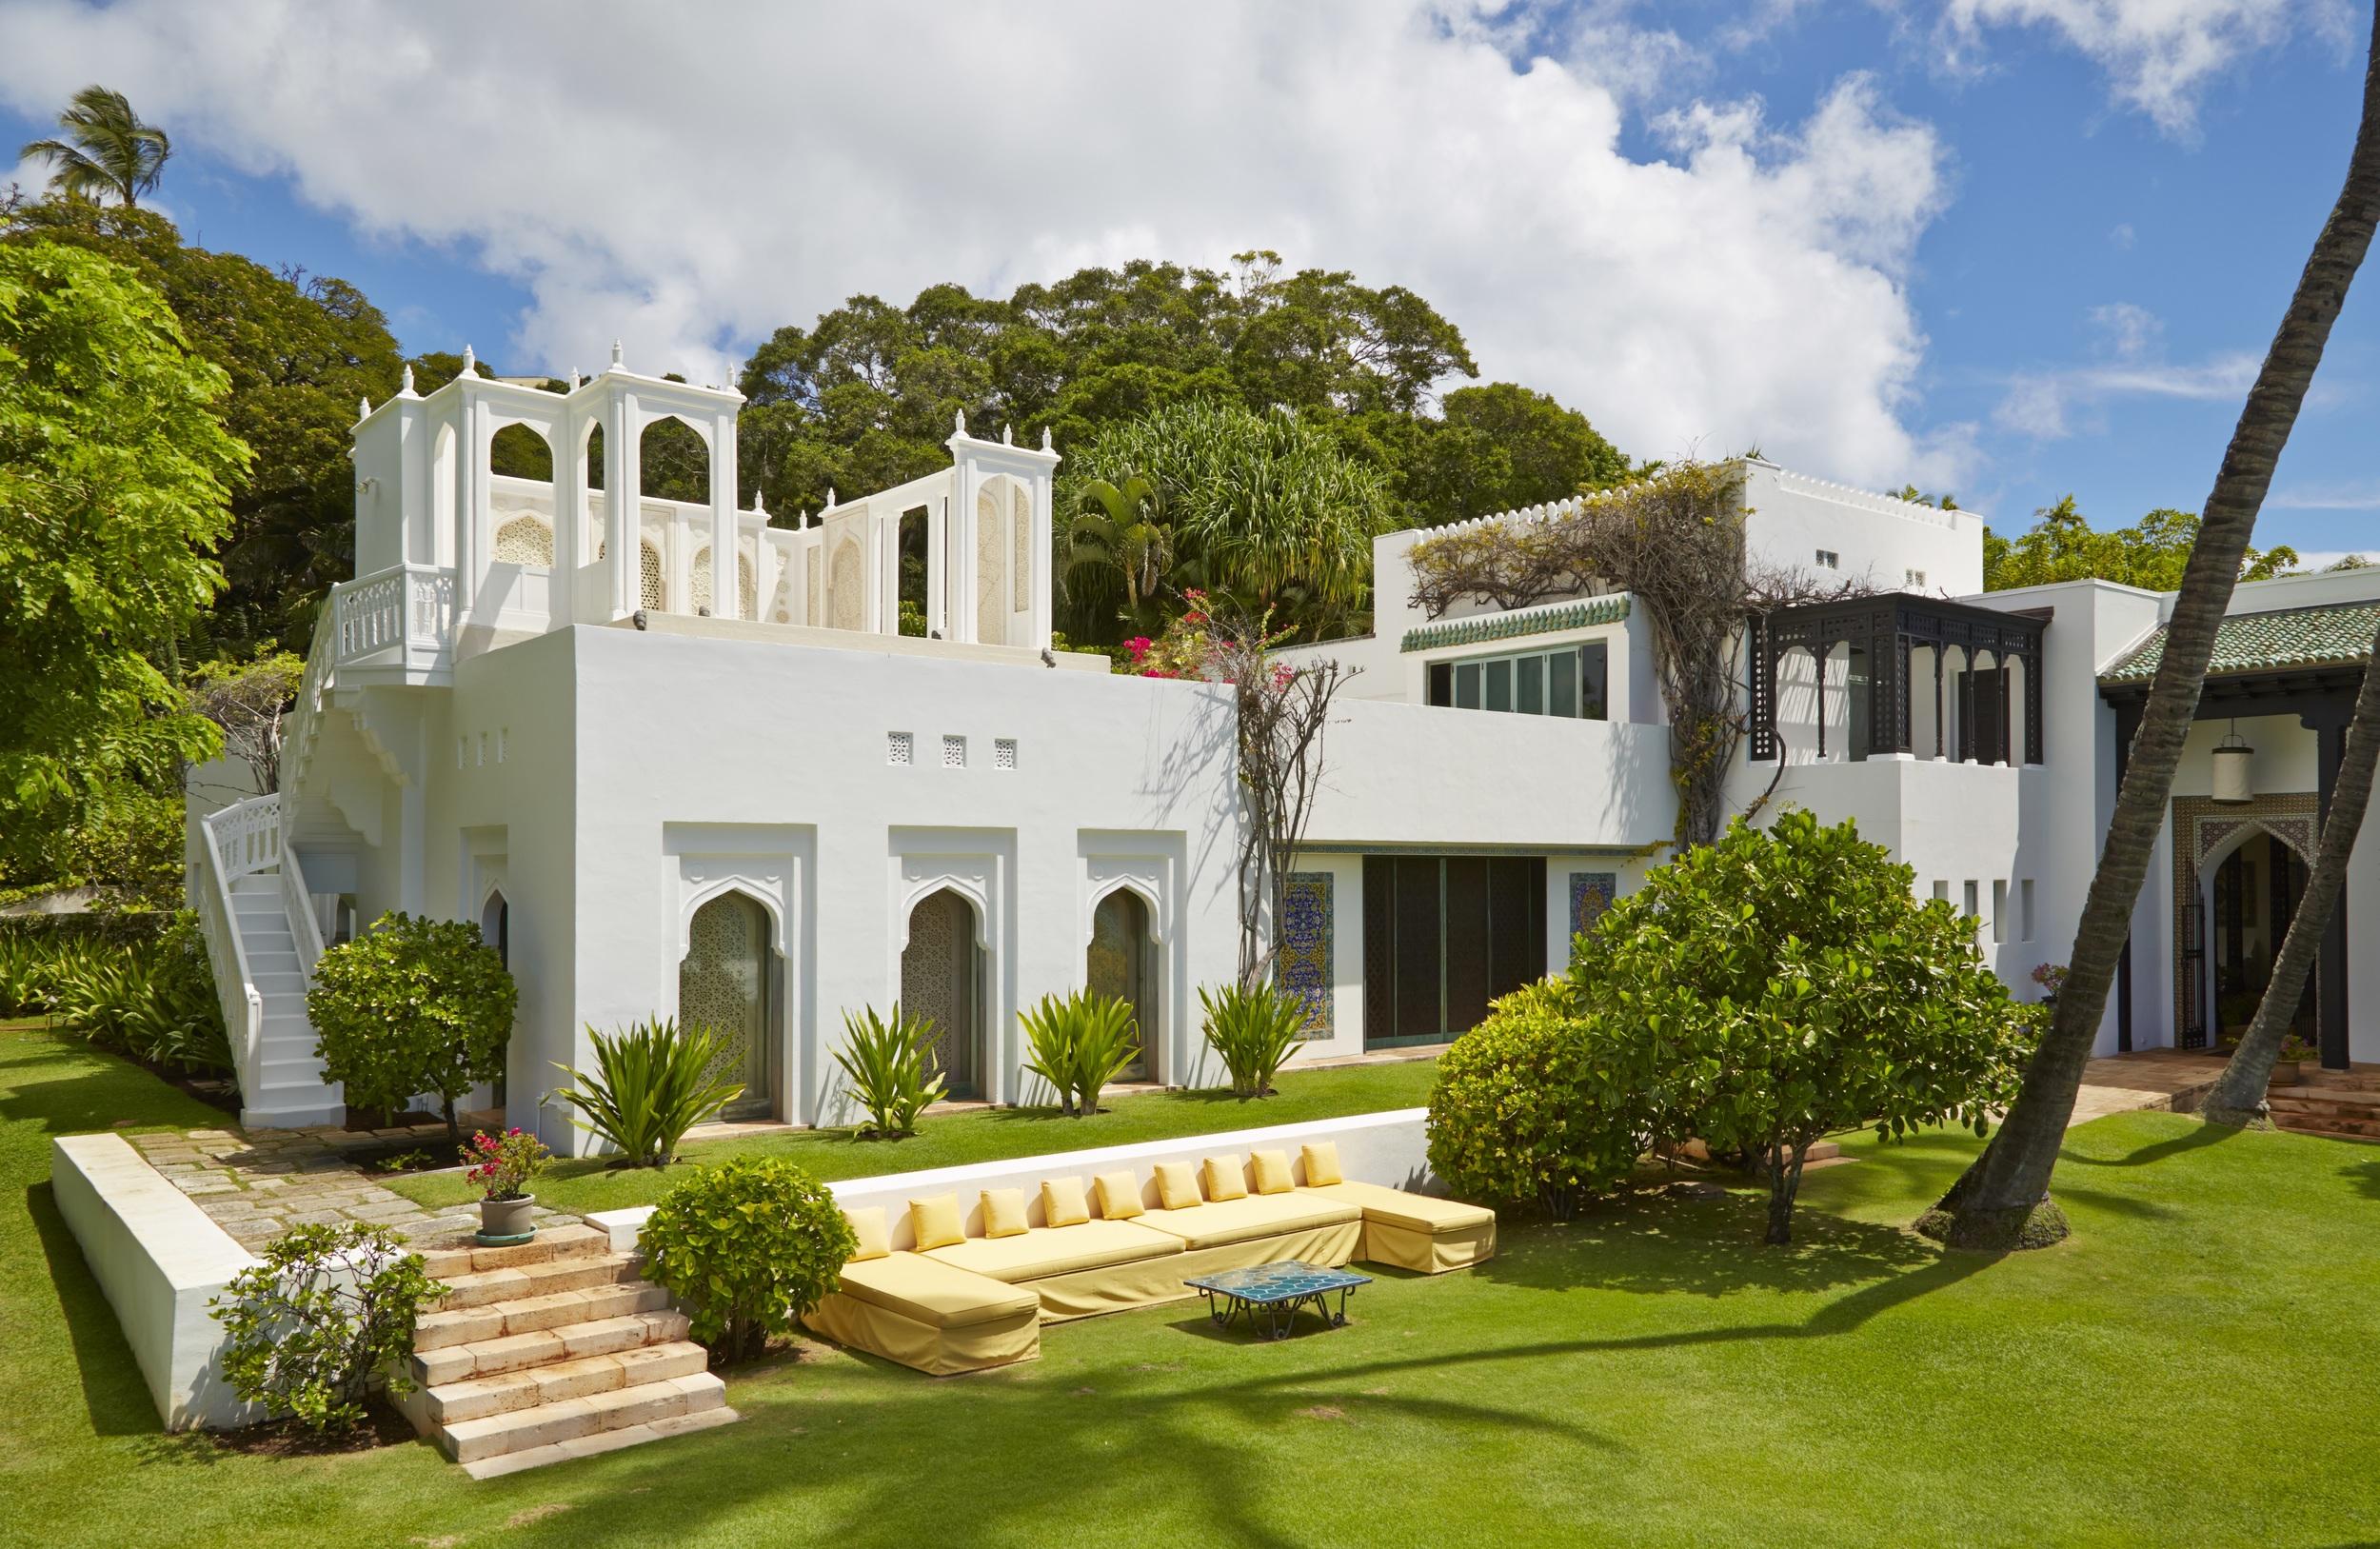 Doris Duke's Shangri La -